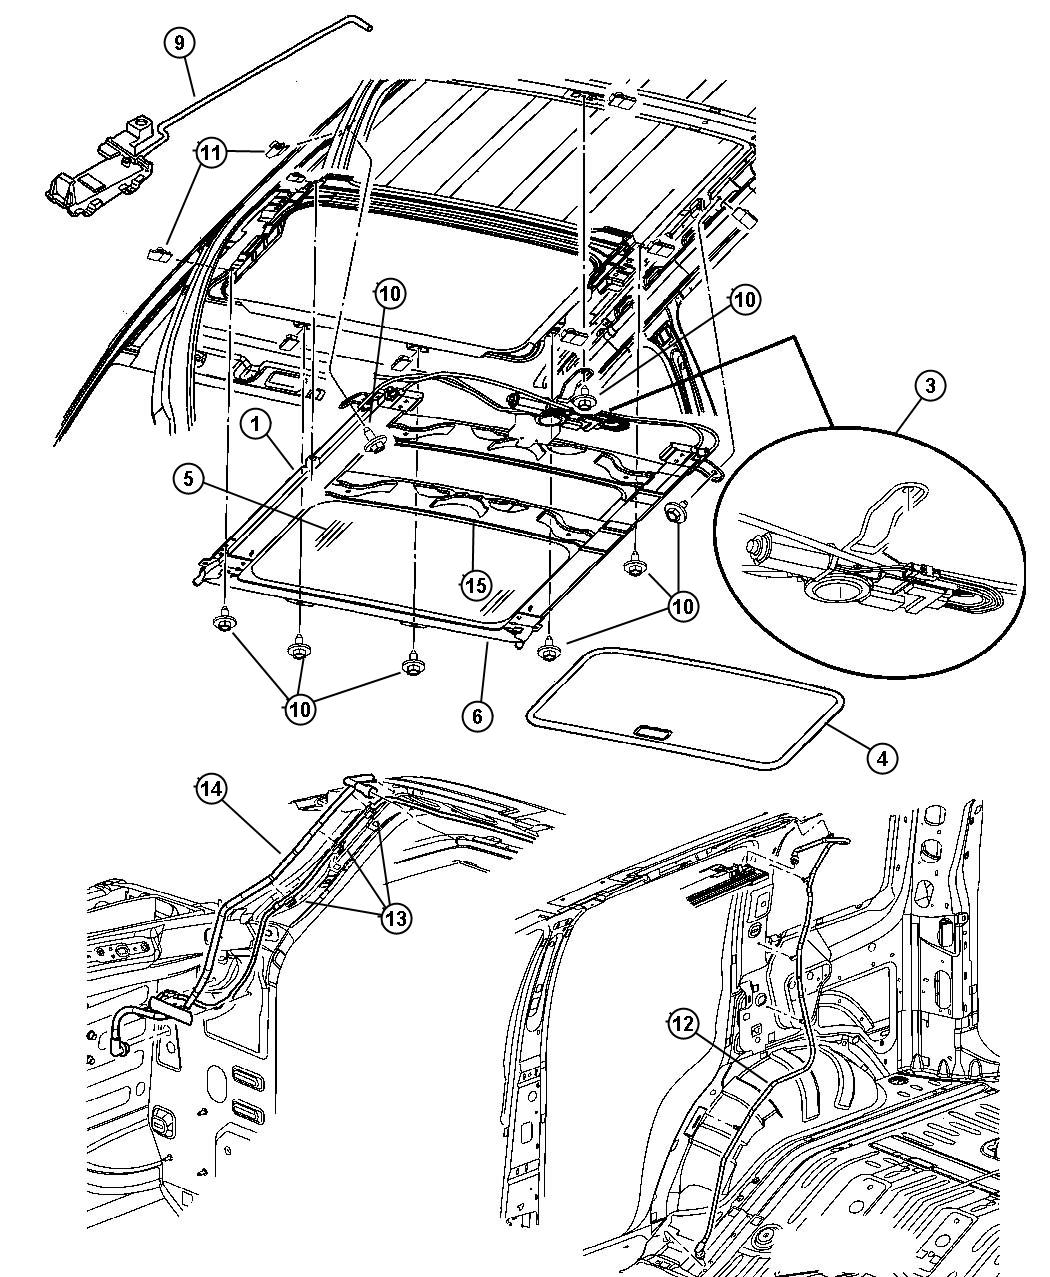 Jeep mander sunroof diagram jeep mander sunroof diagram jeep tool box jeep mander